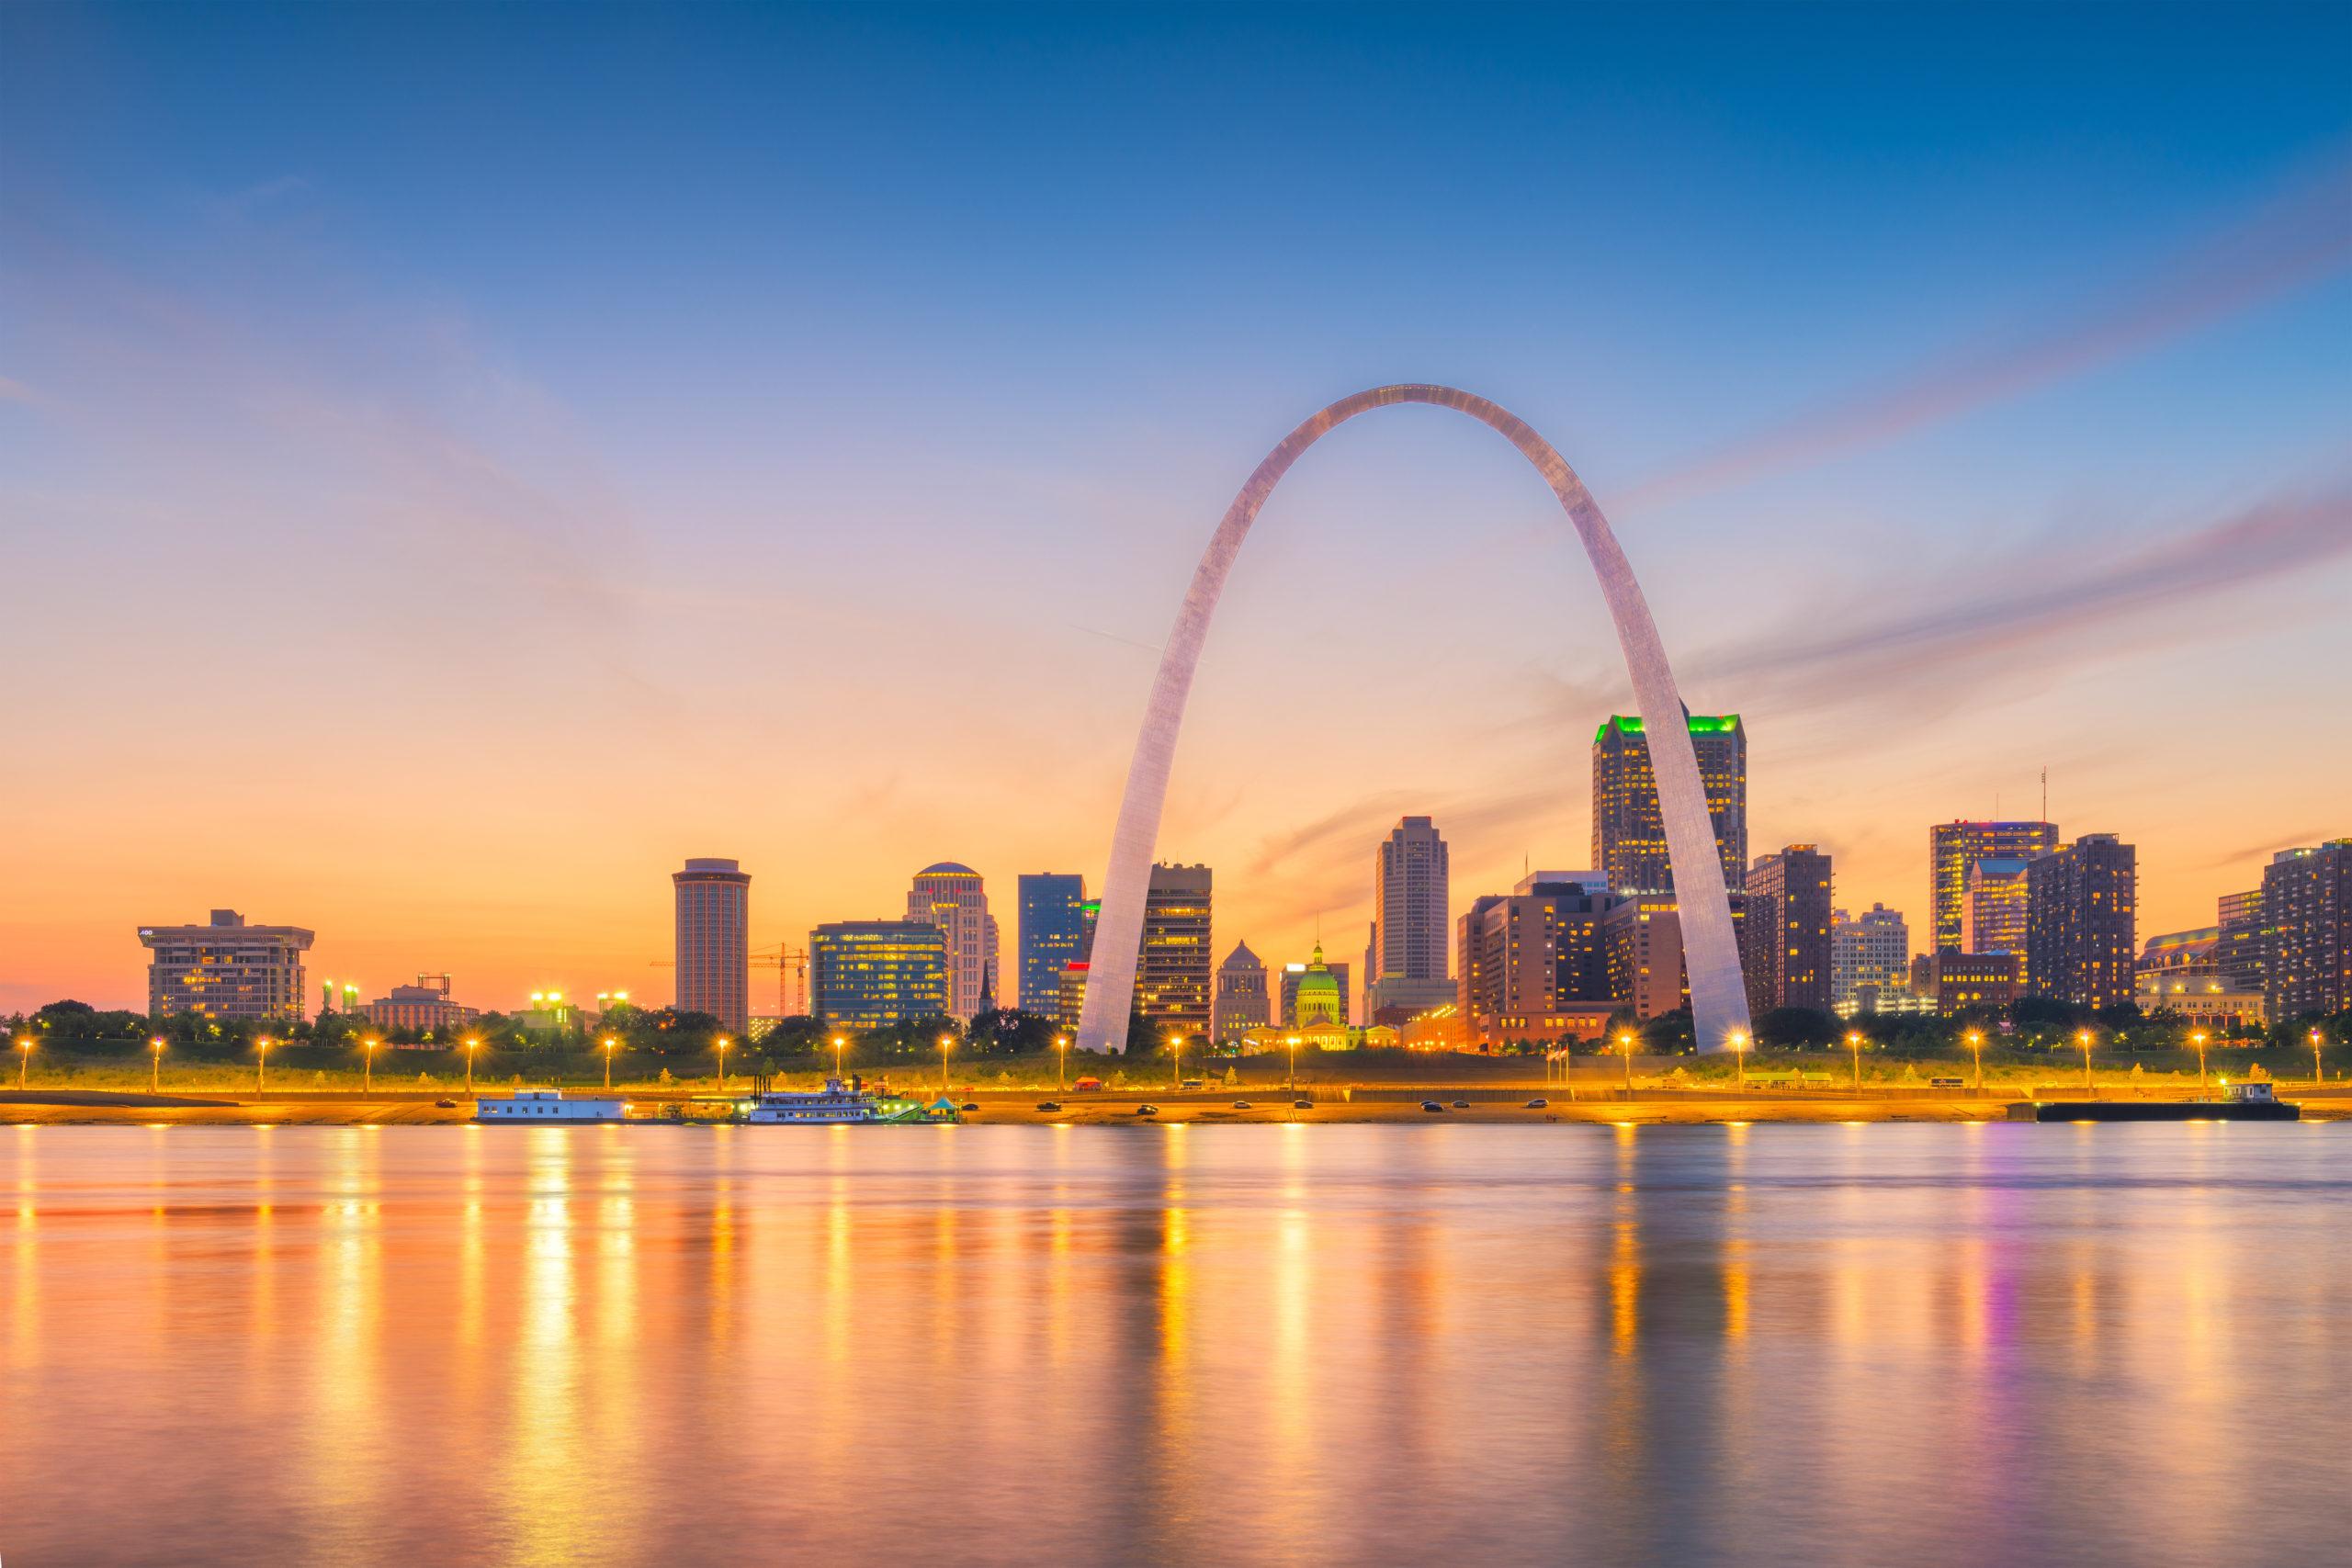 With No Medical Dispensaries Yet Open, Campaign for Missouri Recreational Marijuana Begins.